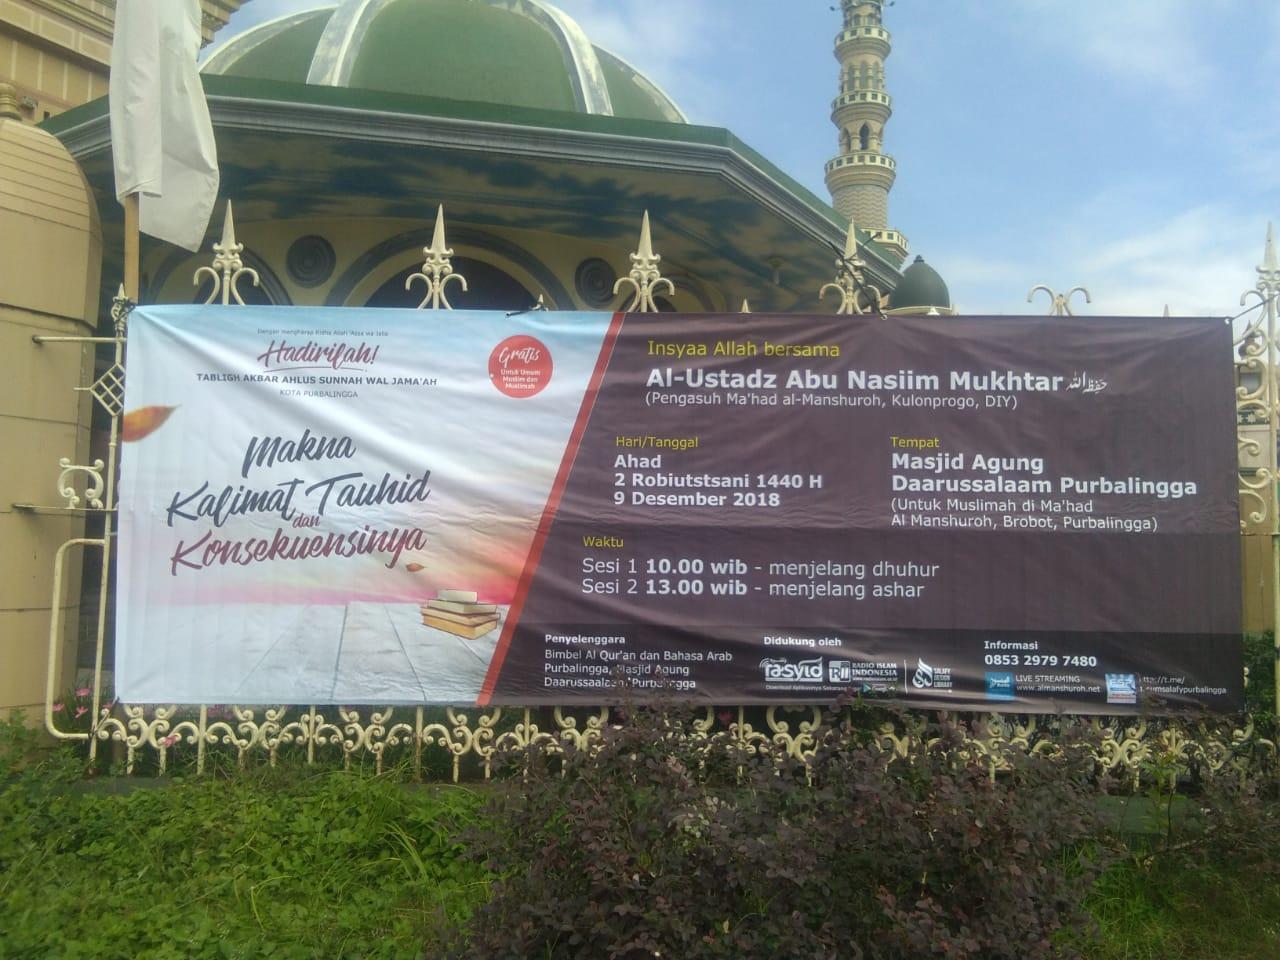 Audio Muhadharah Ustadz Abu Nasim Mukhtar Bulan Robiuttsani 1440 H di Purbalingga